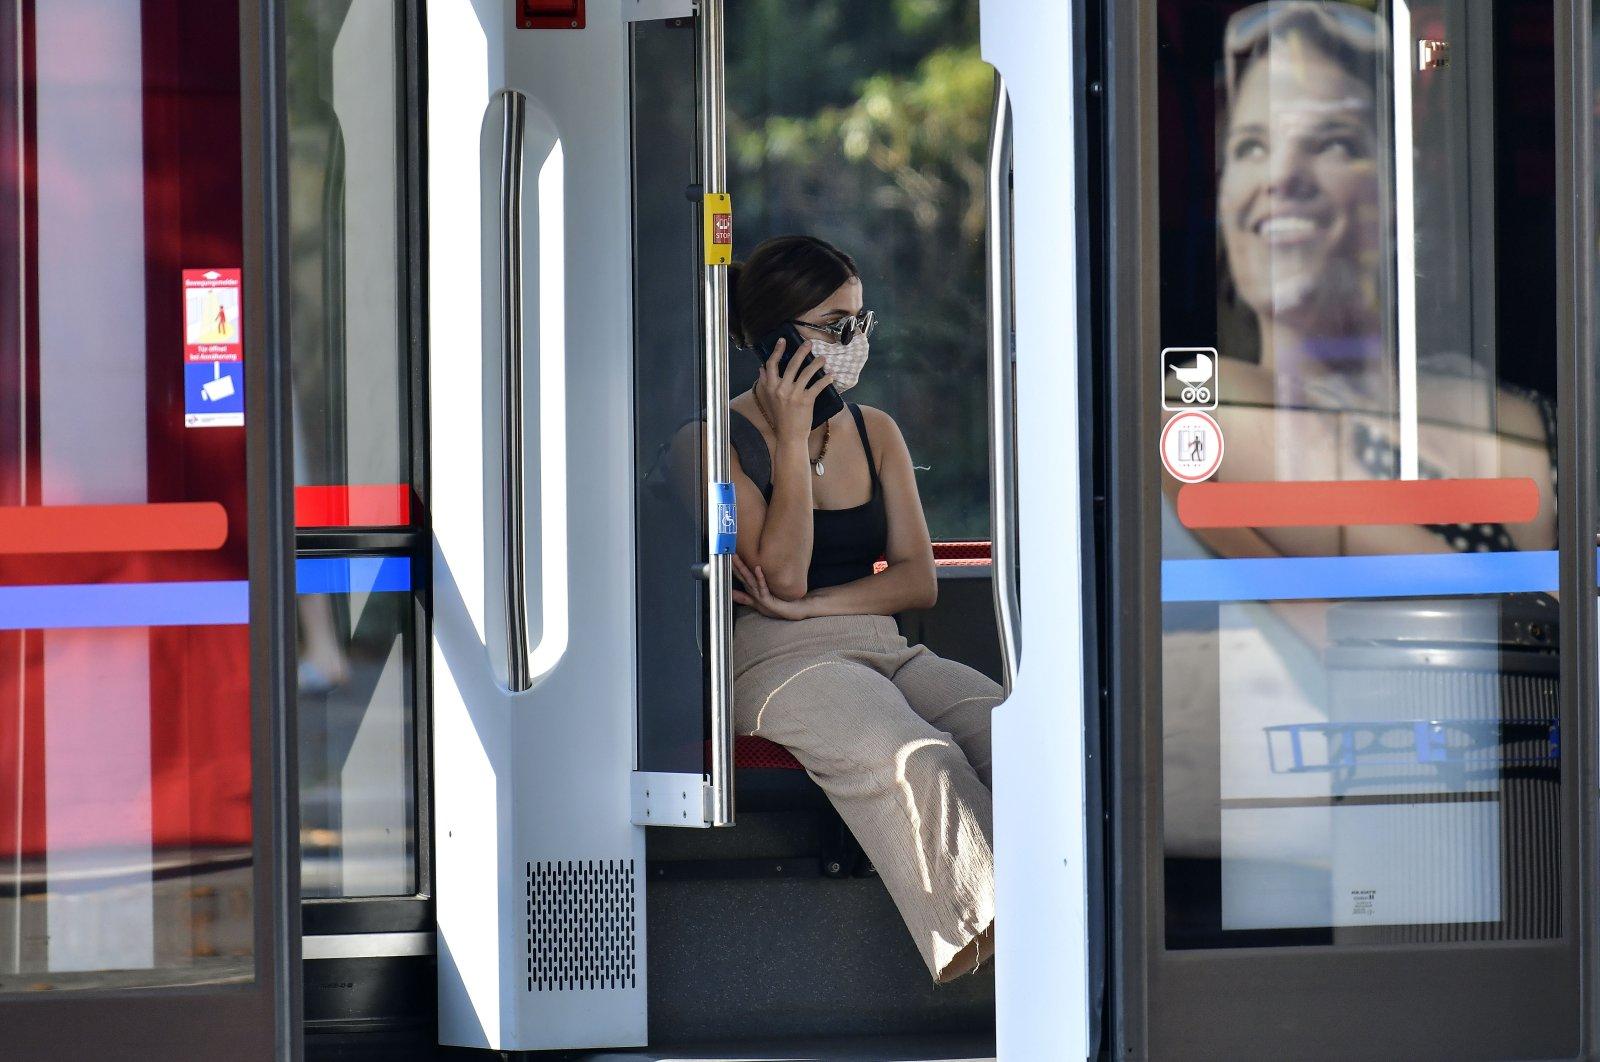 A passenger wears a face mask on a tram in Gelsenkirchen, Germany, Aug. 12, 2020. (AP Photo)